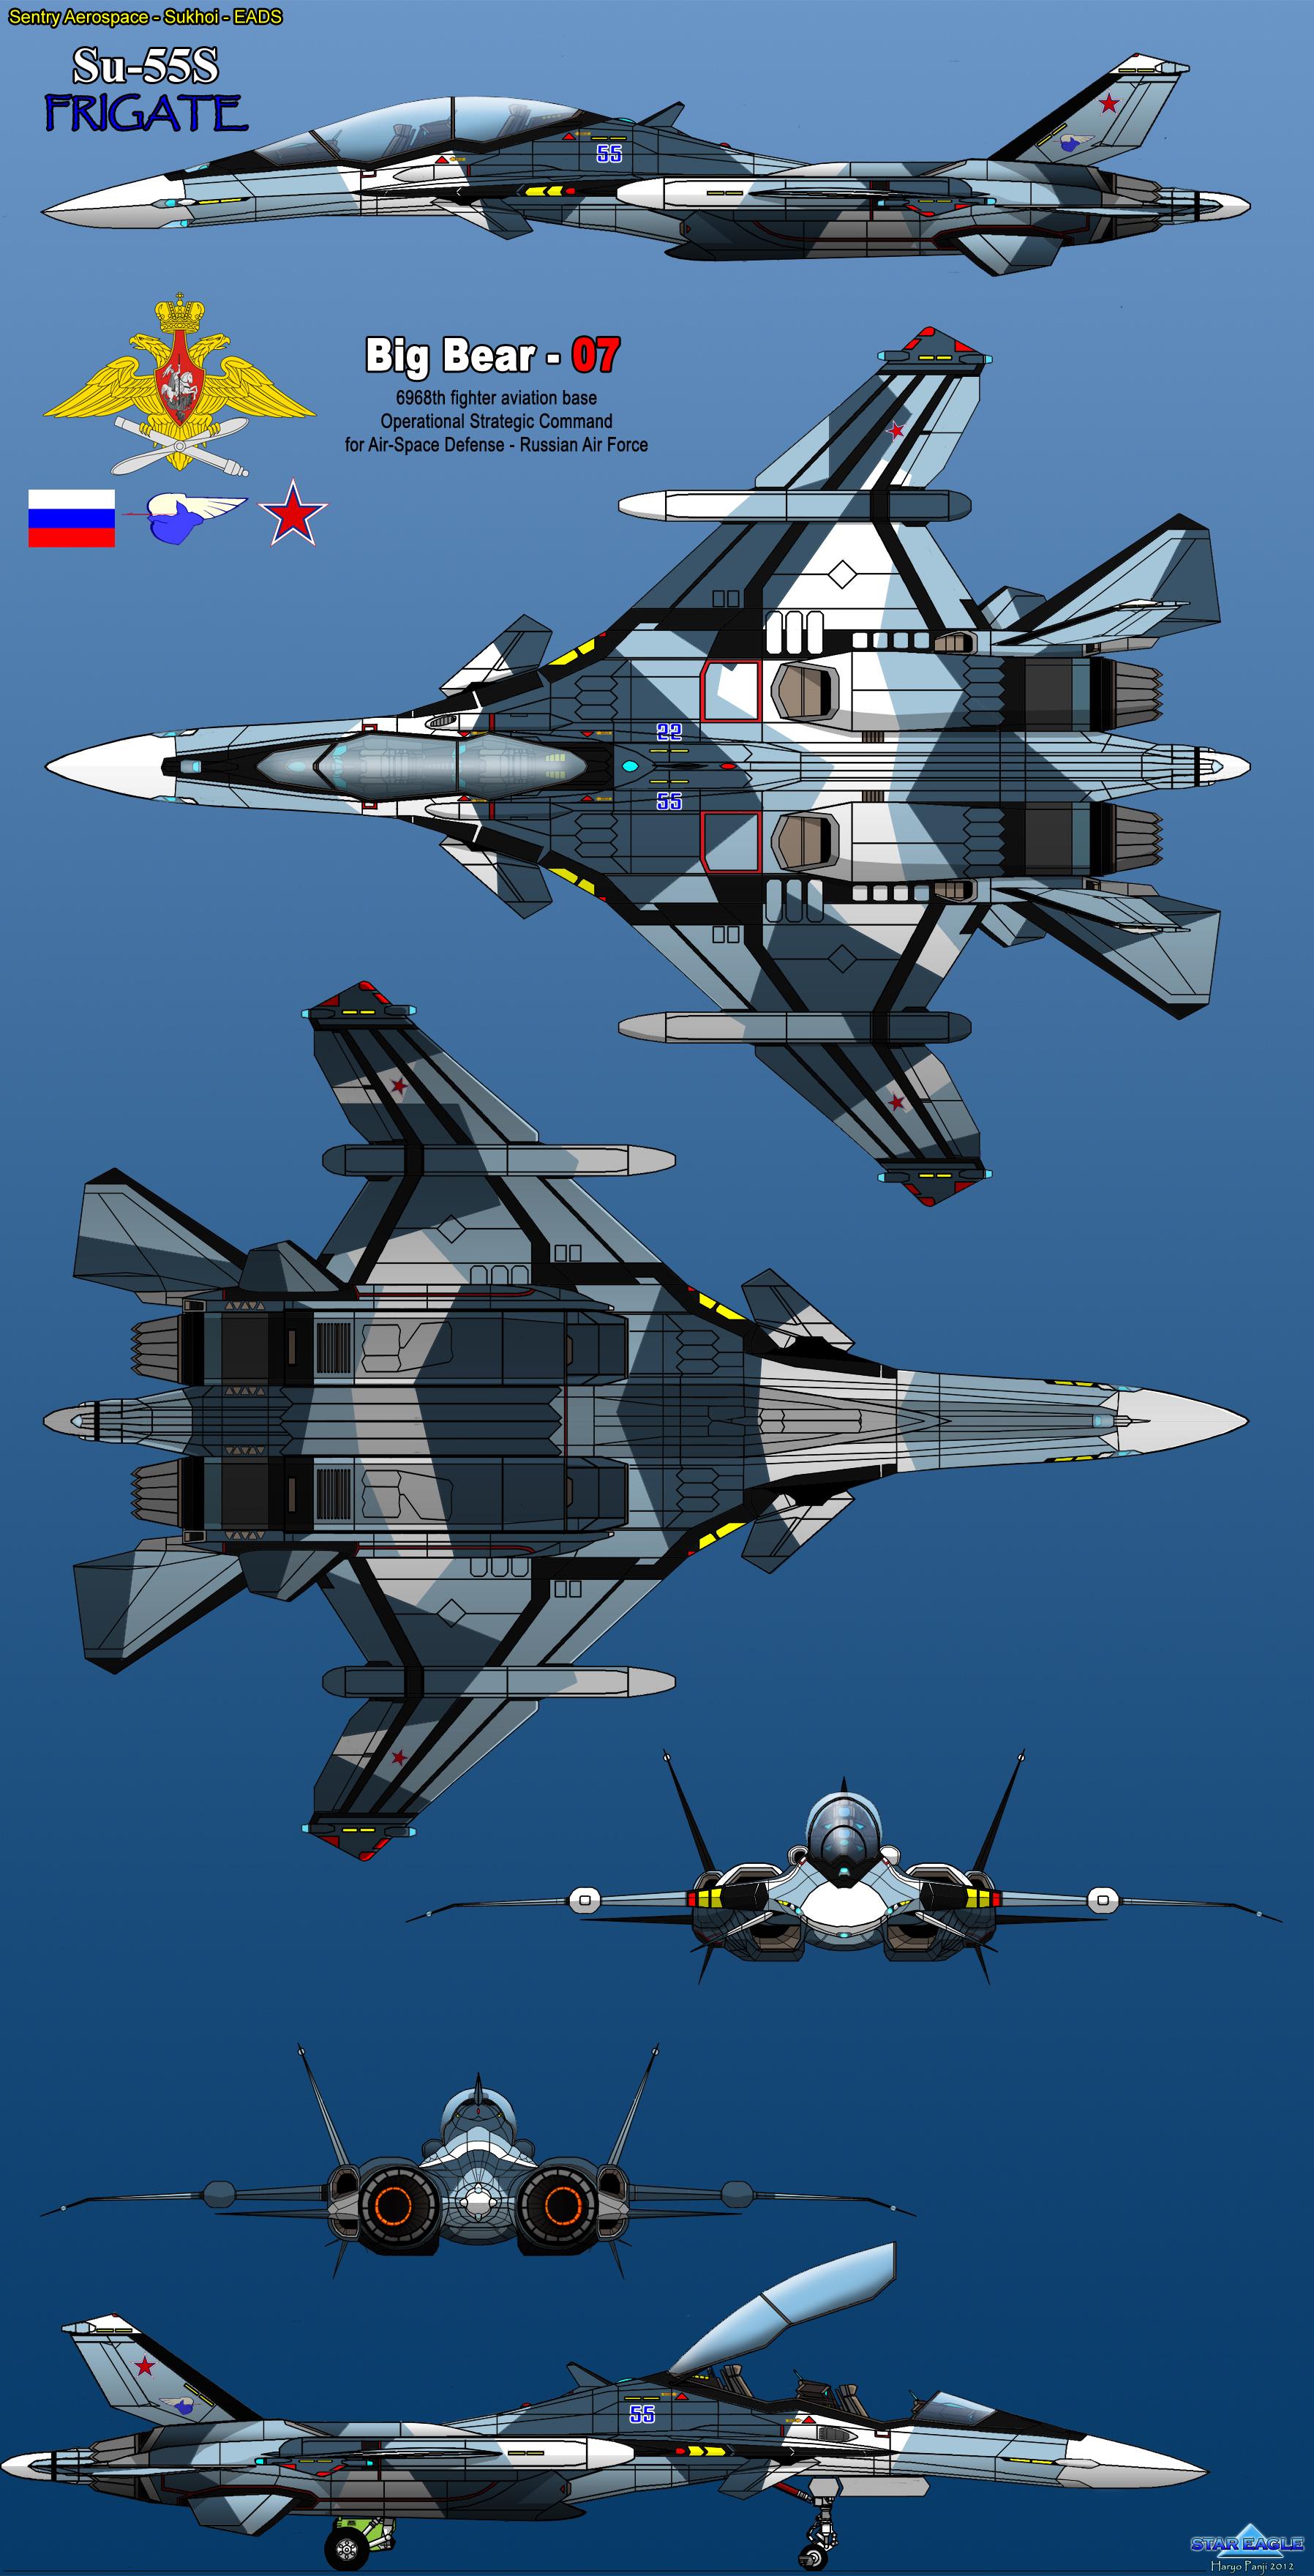 Sukhoi Su-55S Frigate by haryopanji